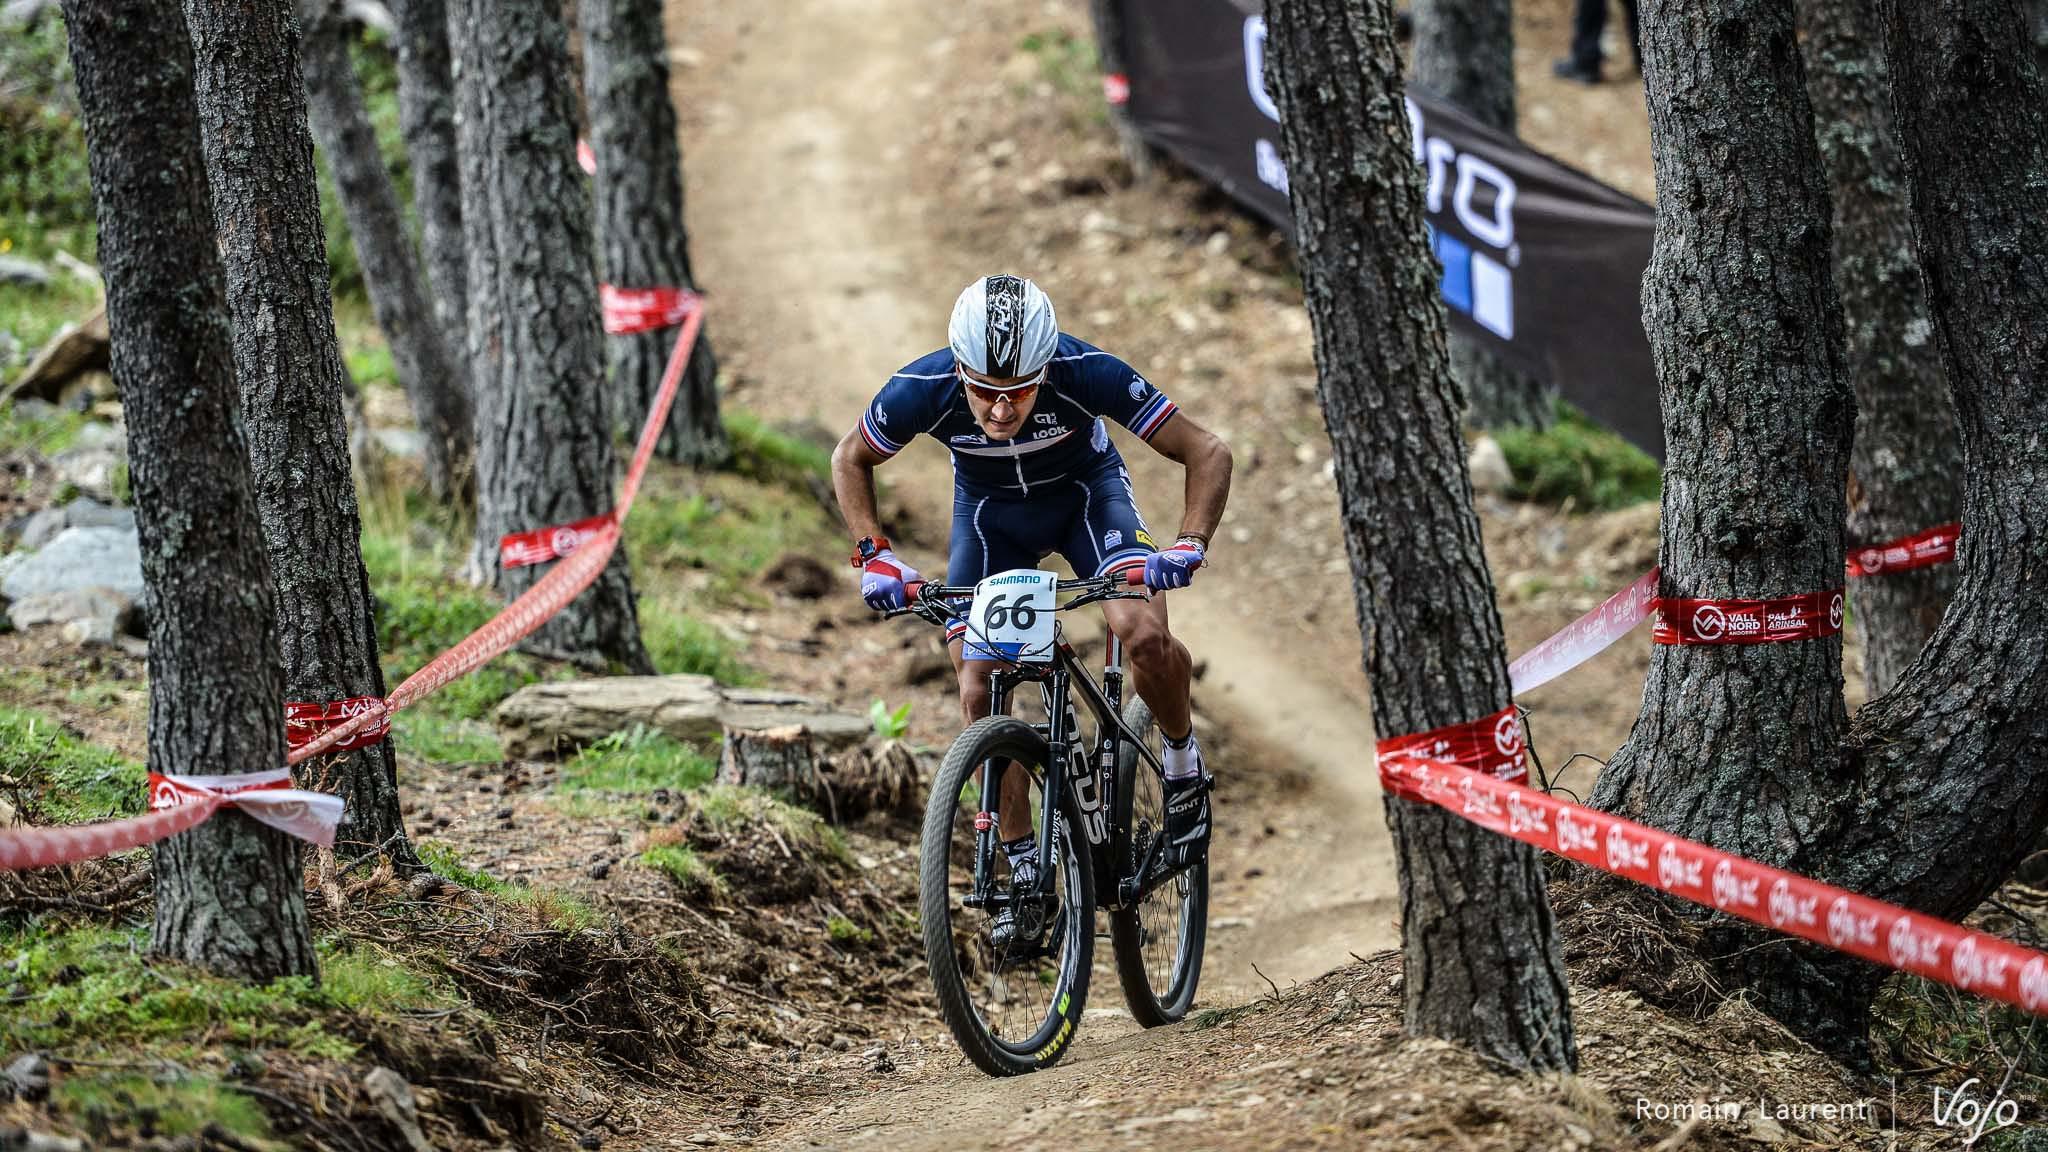 World_Championship_Andorra_Vallnord_XC_Eliminator_2015_Copyright_Romain_Laurent_VojoMag-17